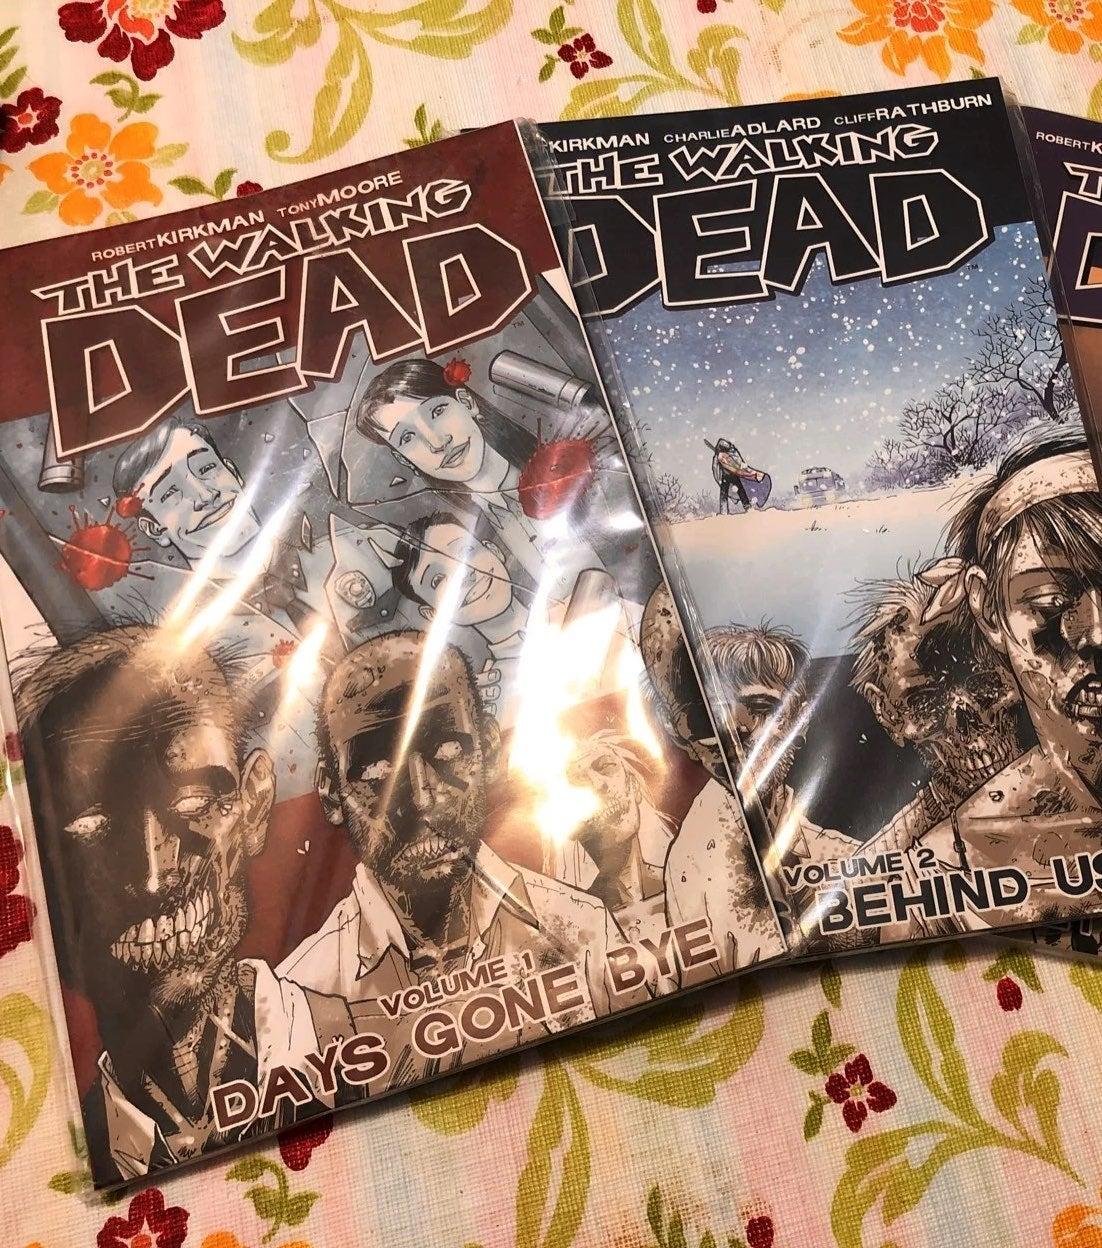 The Walking Dead volumes 1-2